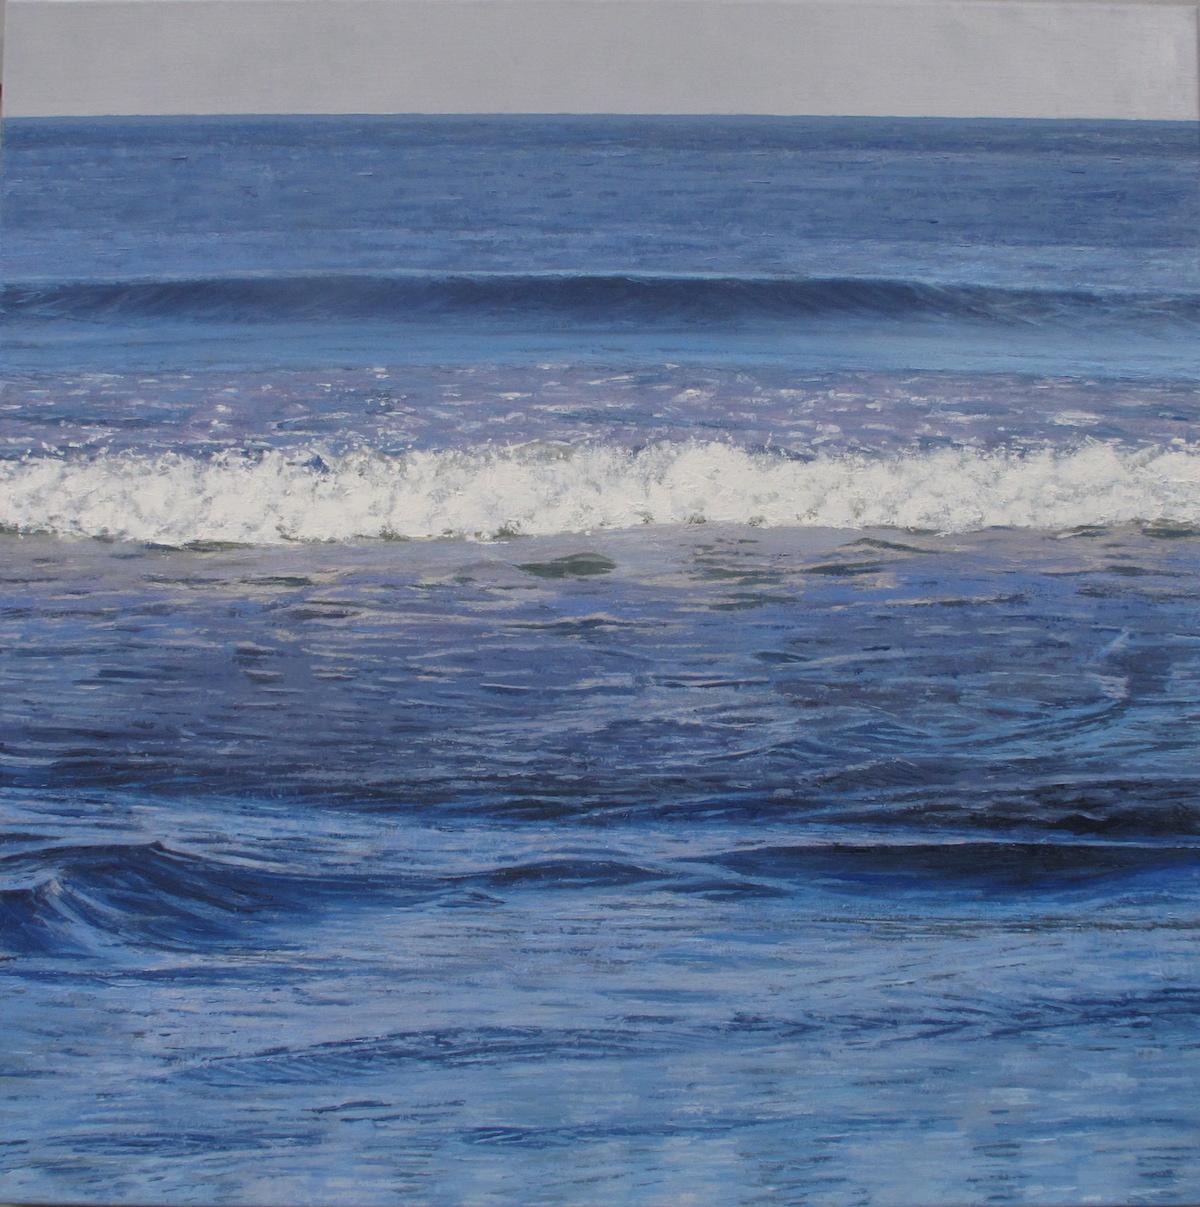 Blue Painting 2018 30x30 copy